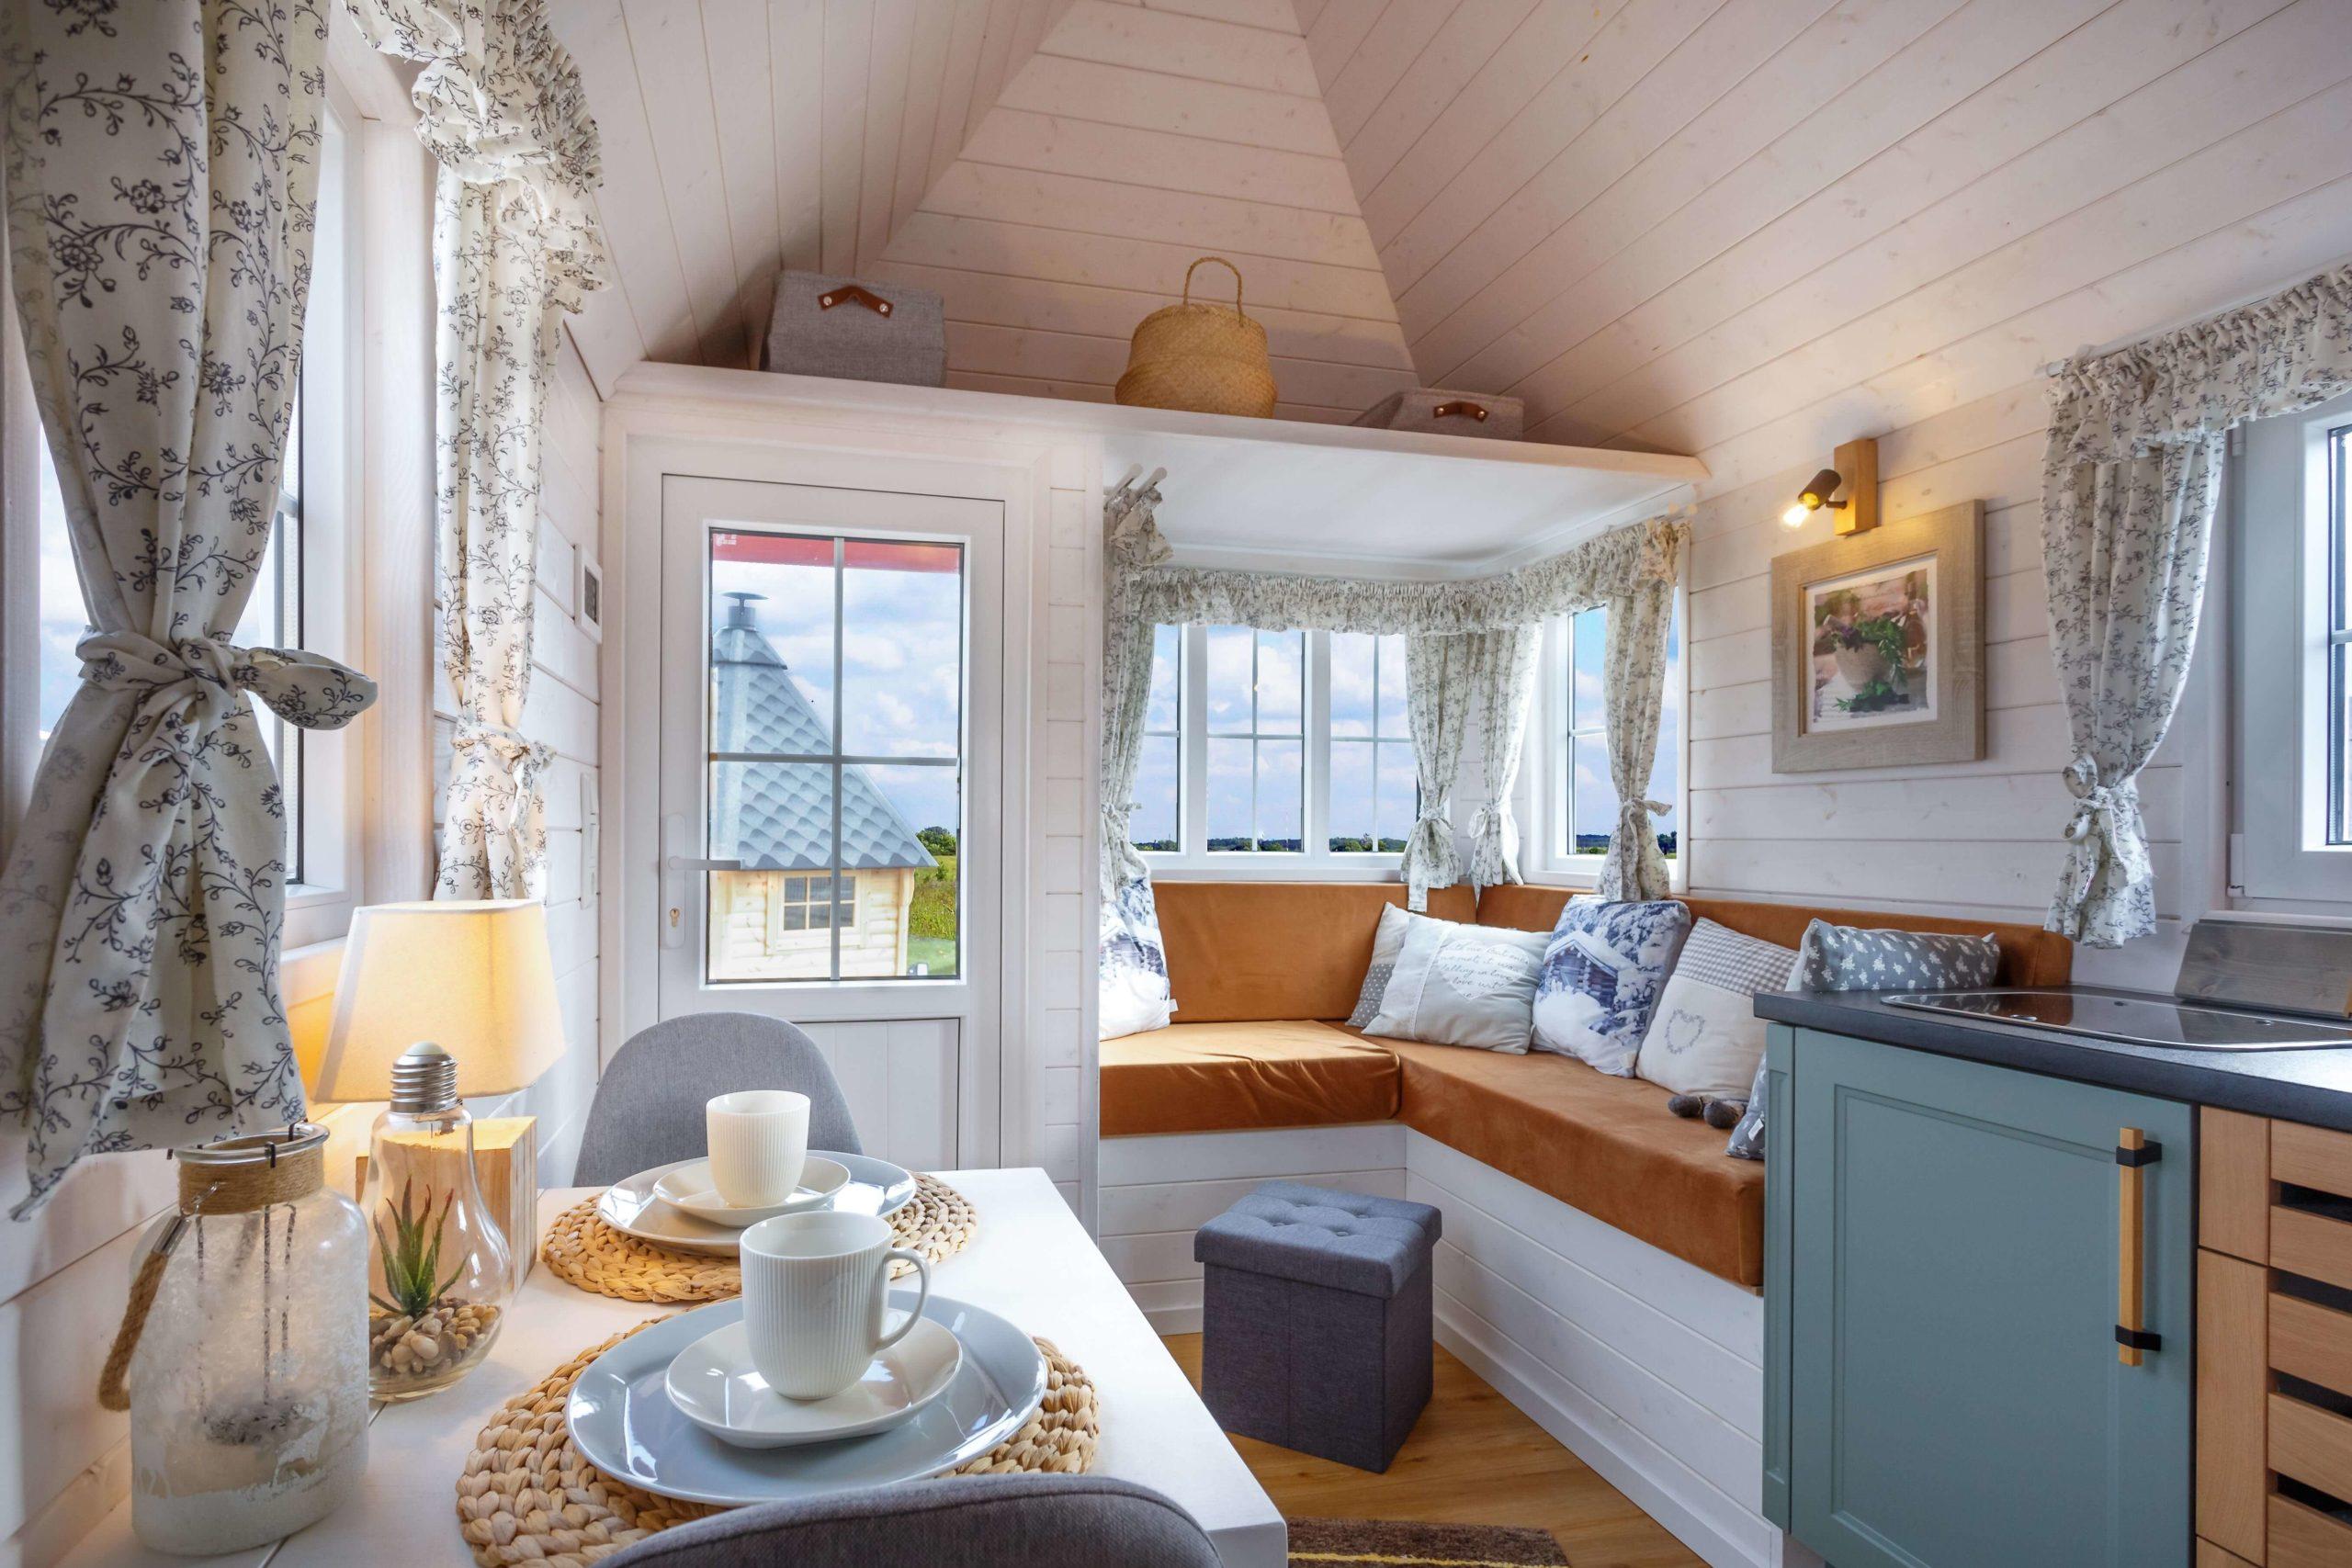 mobiles-tiny-house-schweden-vital-camp-gmbh-14